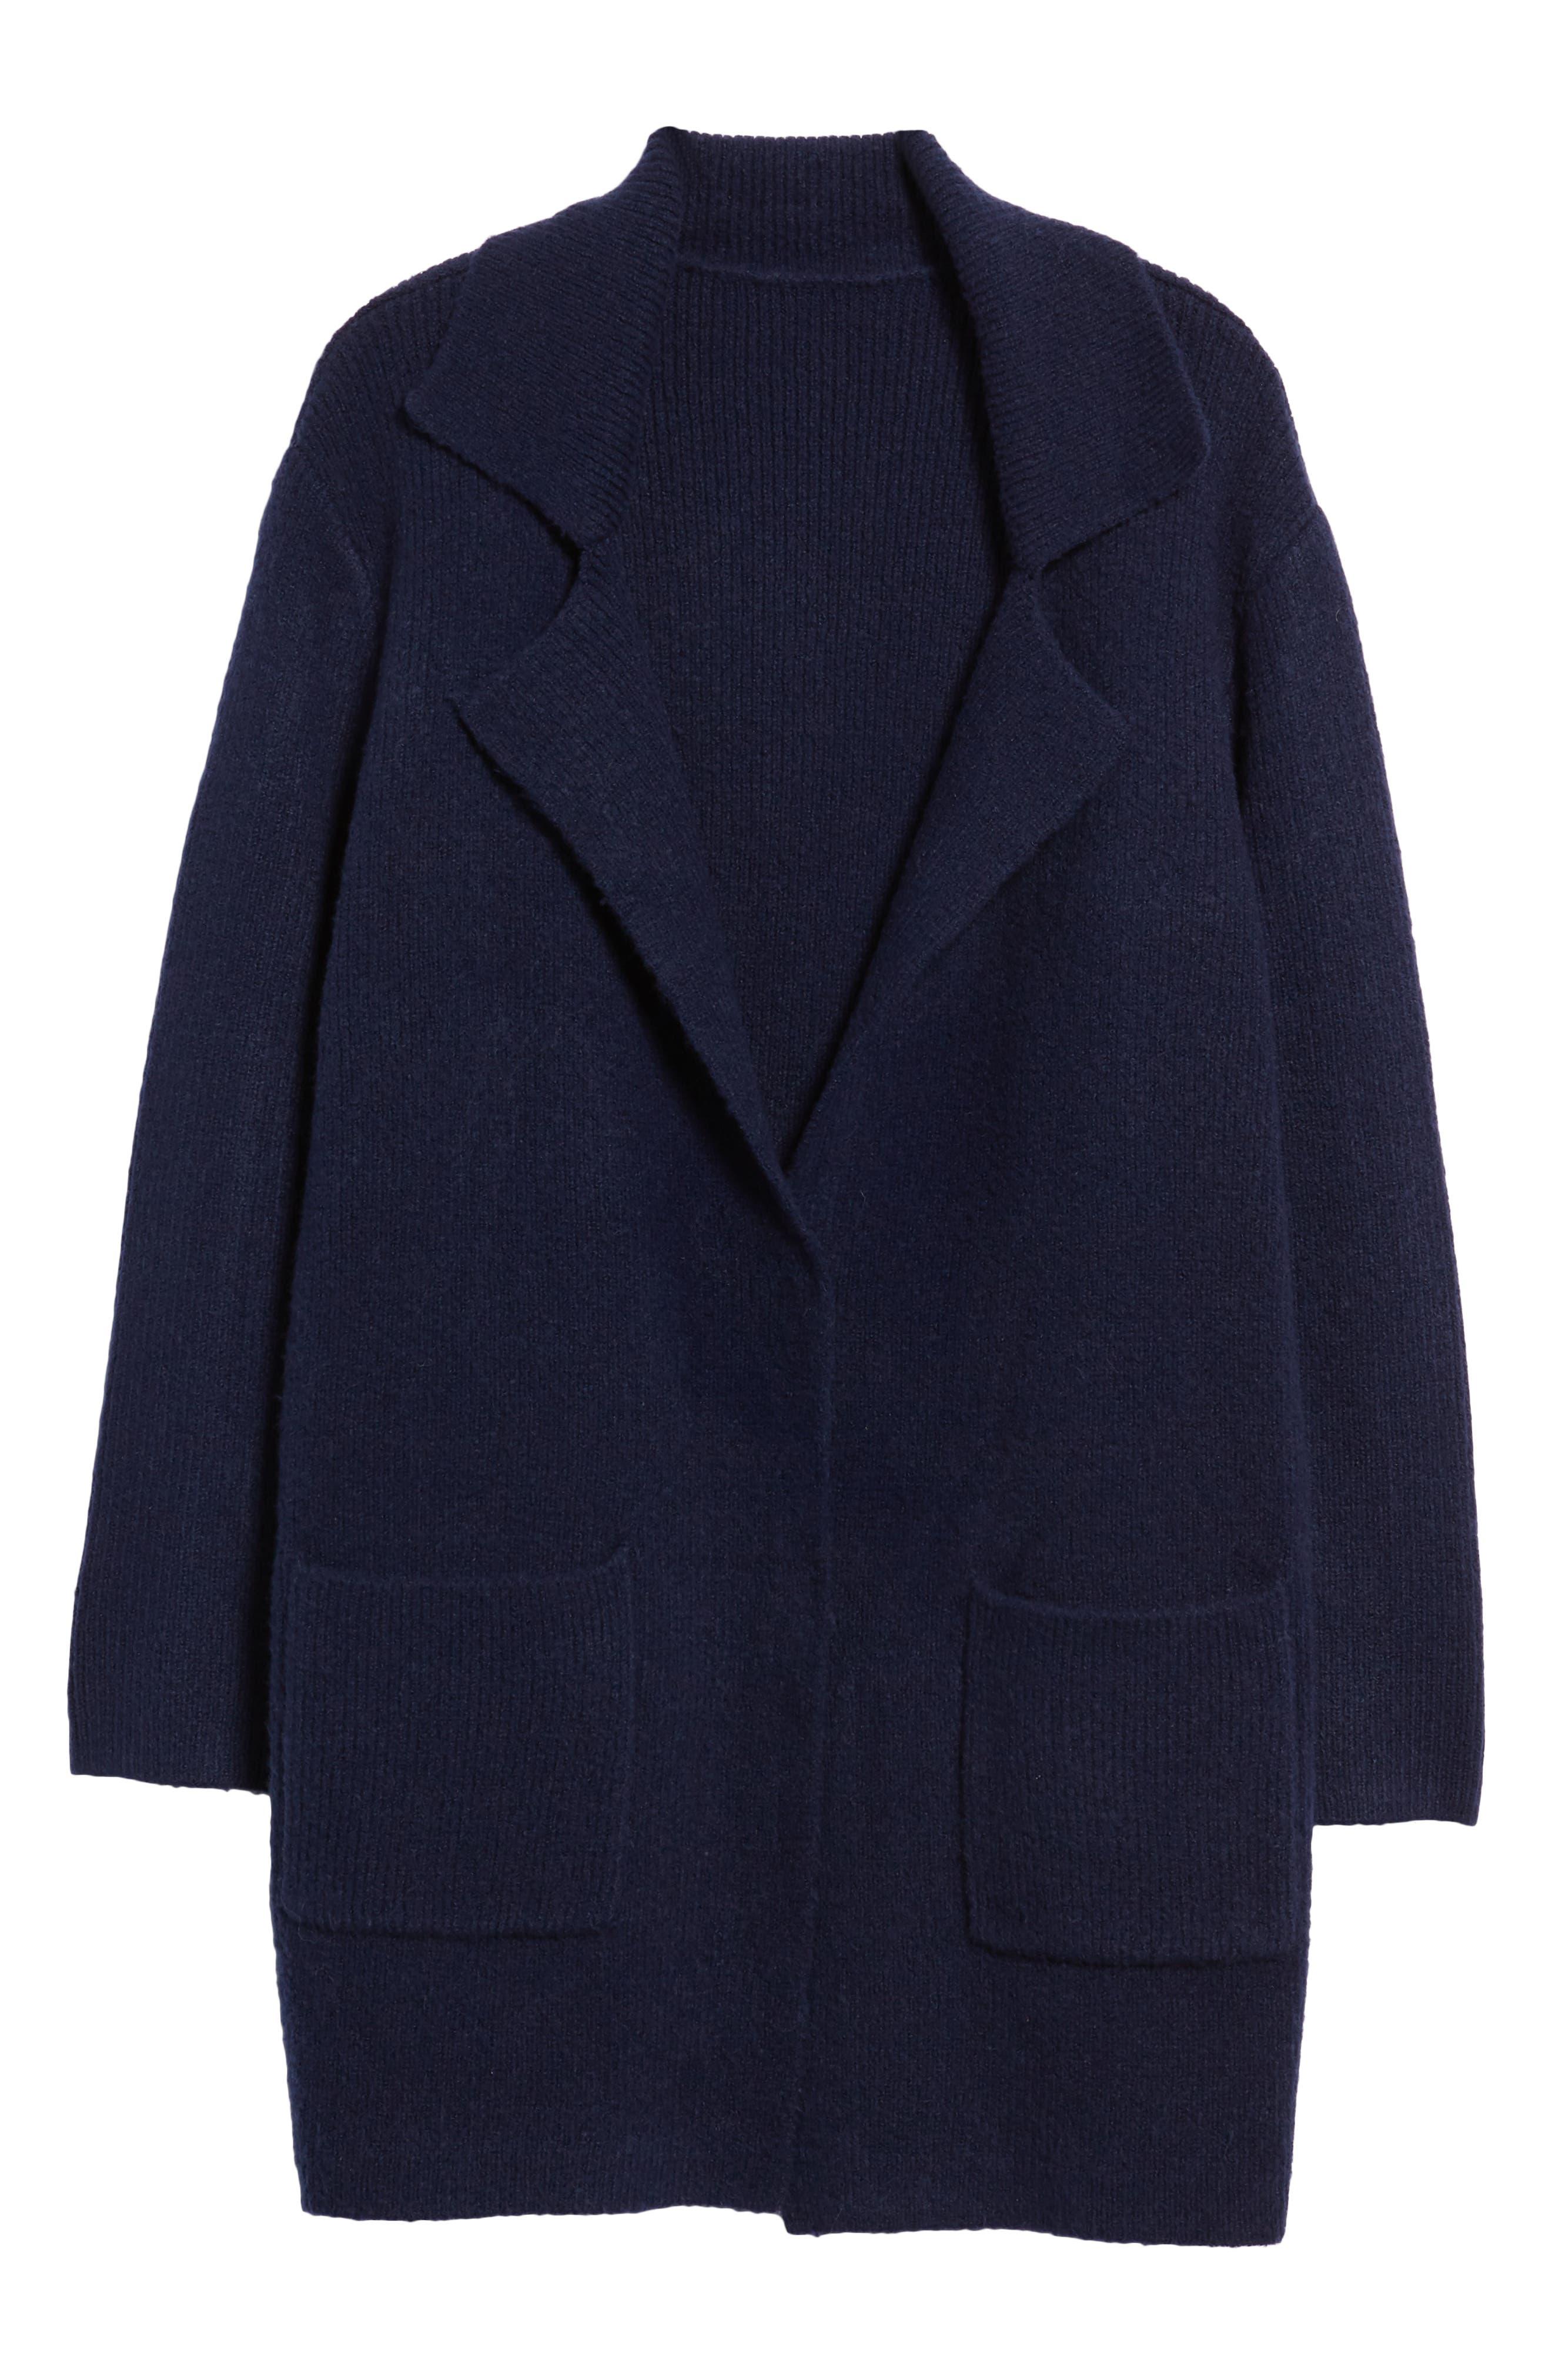 Knit Sweater Coat,                             Alternate thumbnail 6, color,                             NAVY MARITIME